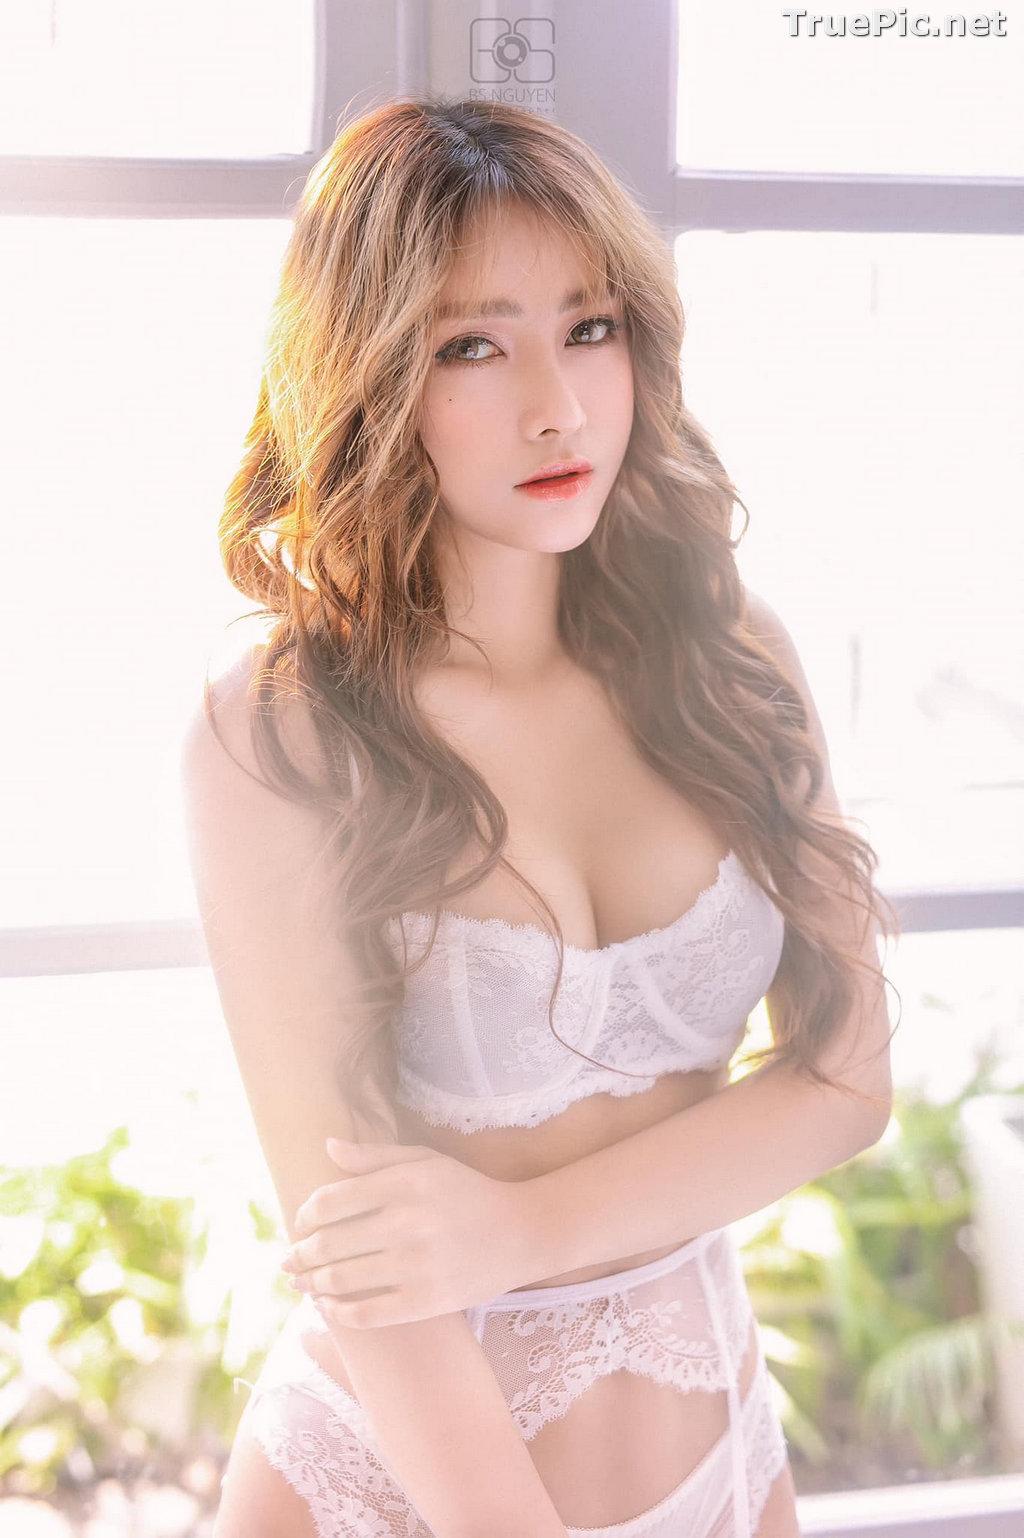 Image Vietnamese Model - Nguyen Thi Phi Yen - Beautiful Sexy White Lingerie - TruePic.net - Picture-19